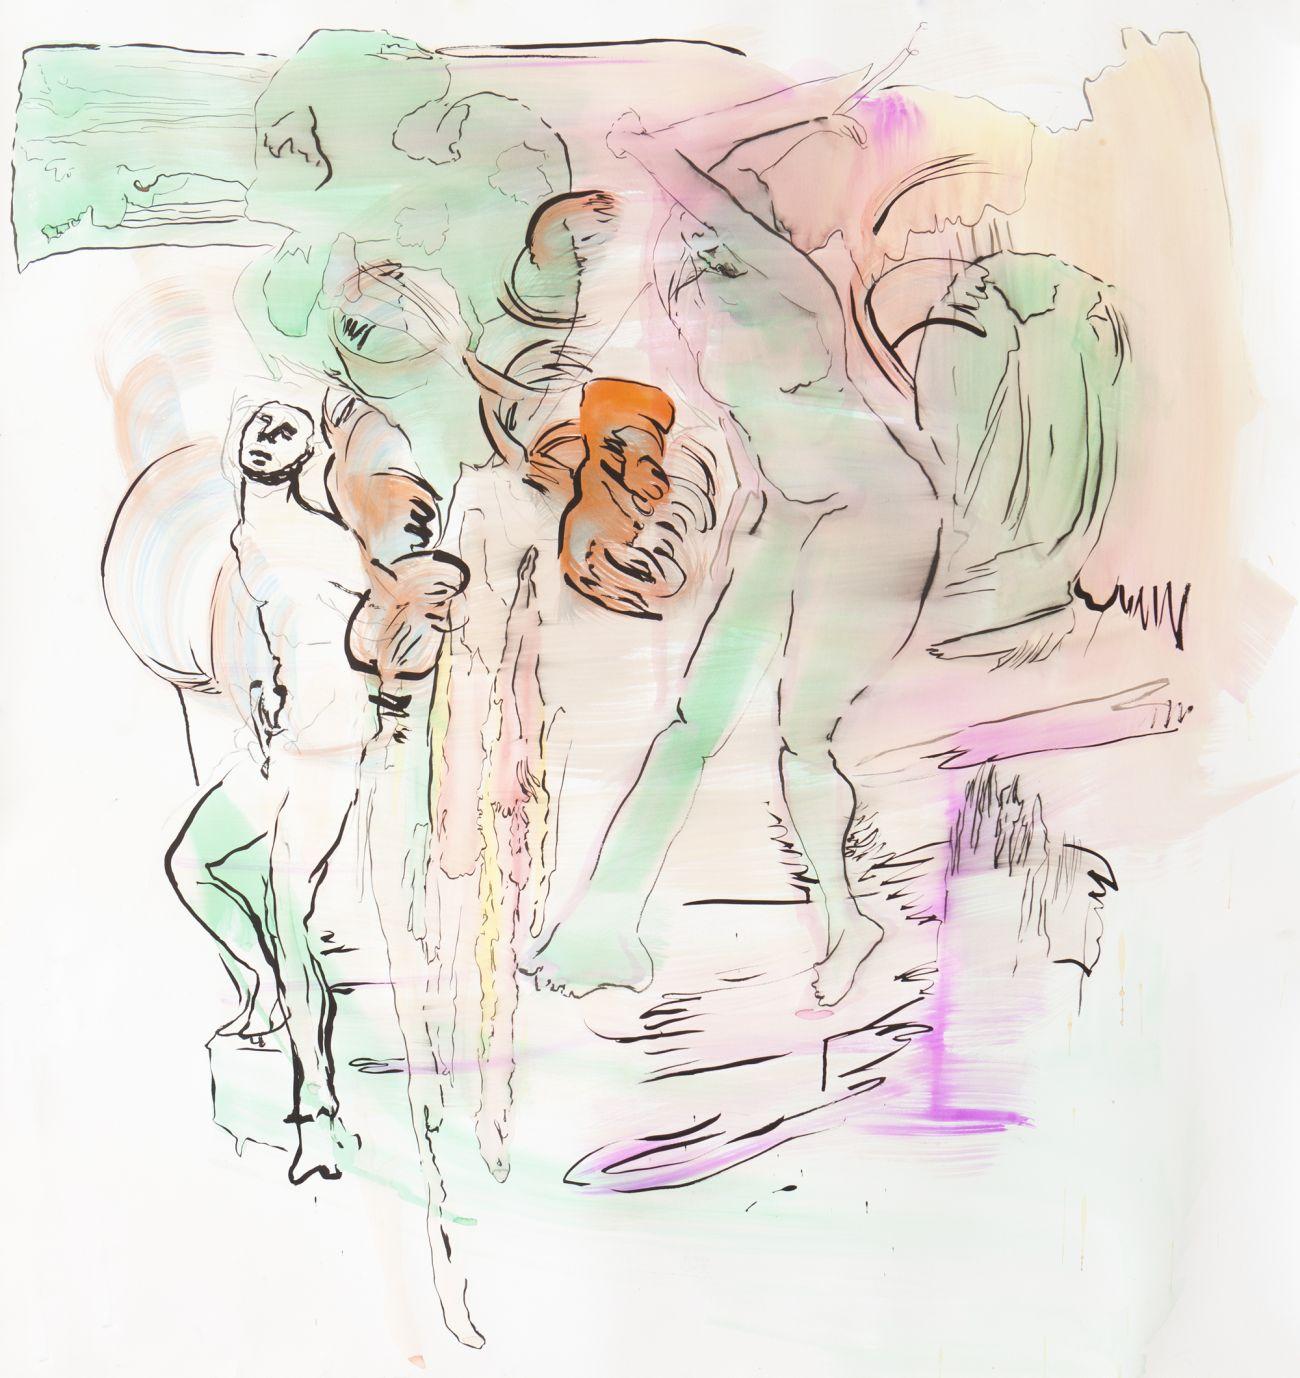 Batalla Imaginaria (2017) - Marian Alzola